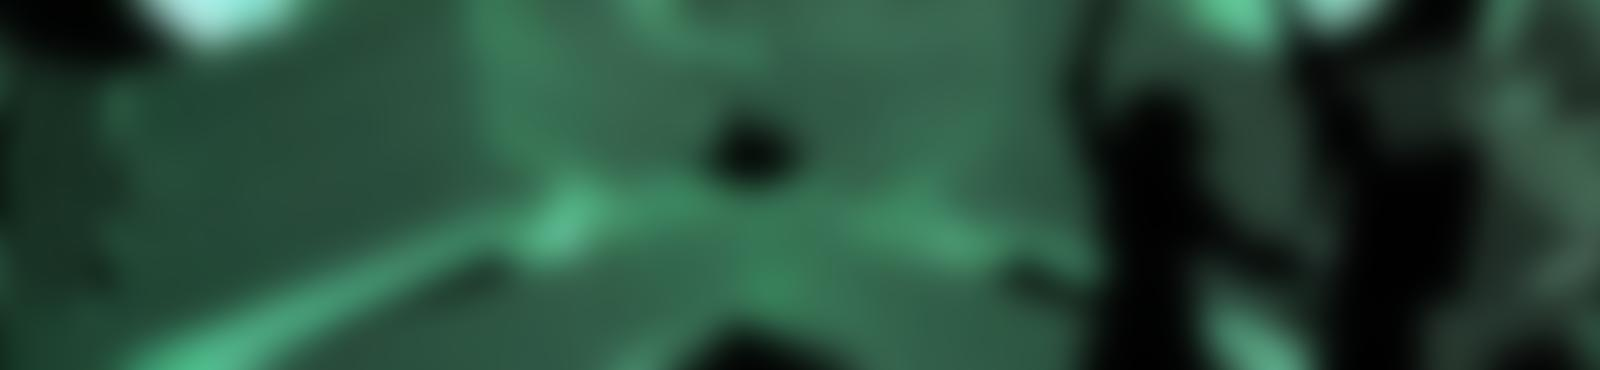 Blurred b92654ef 0621 4f92 8353 92f4eea6e5c3